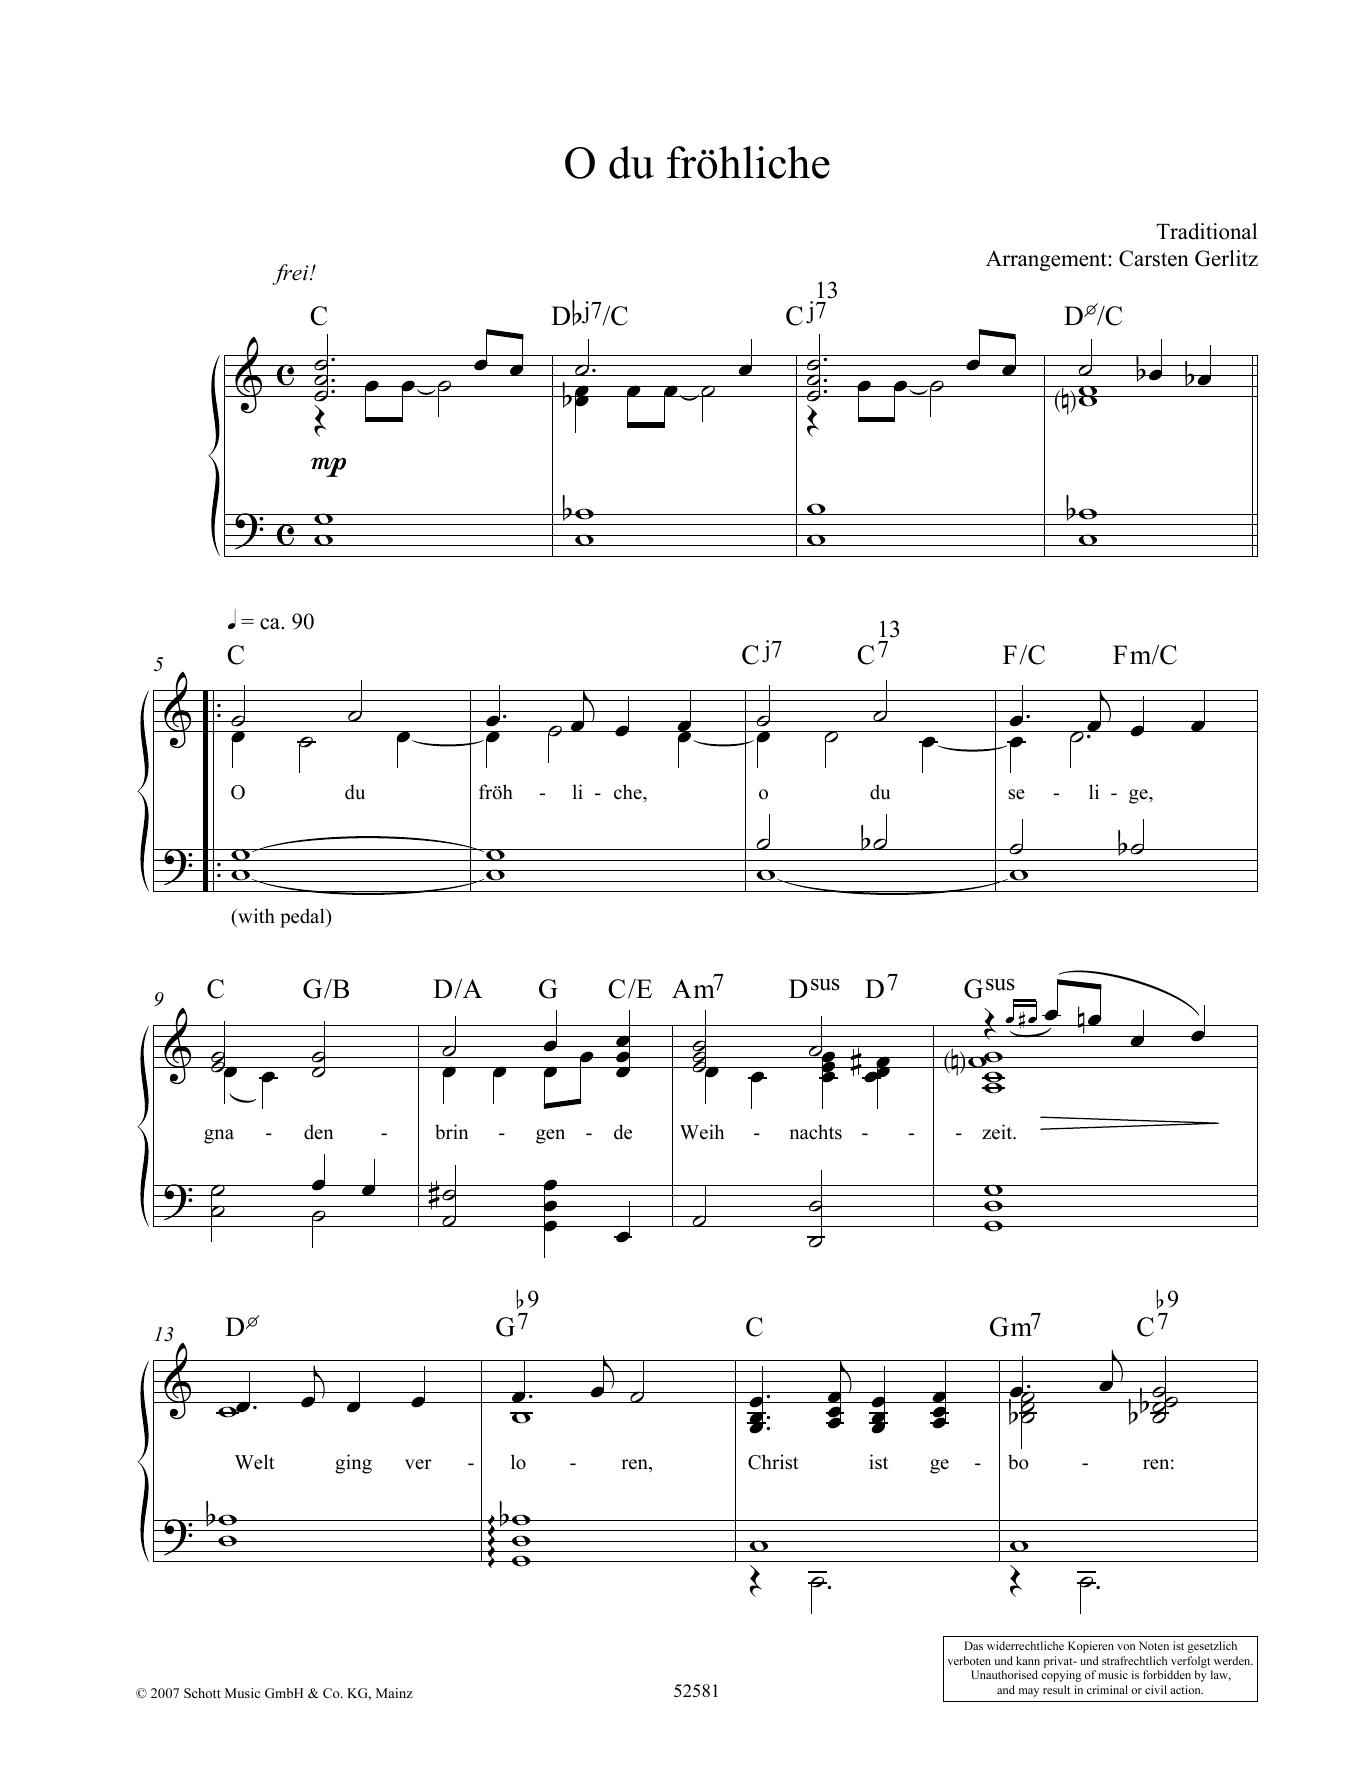 O du frohliche Sheet Music